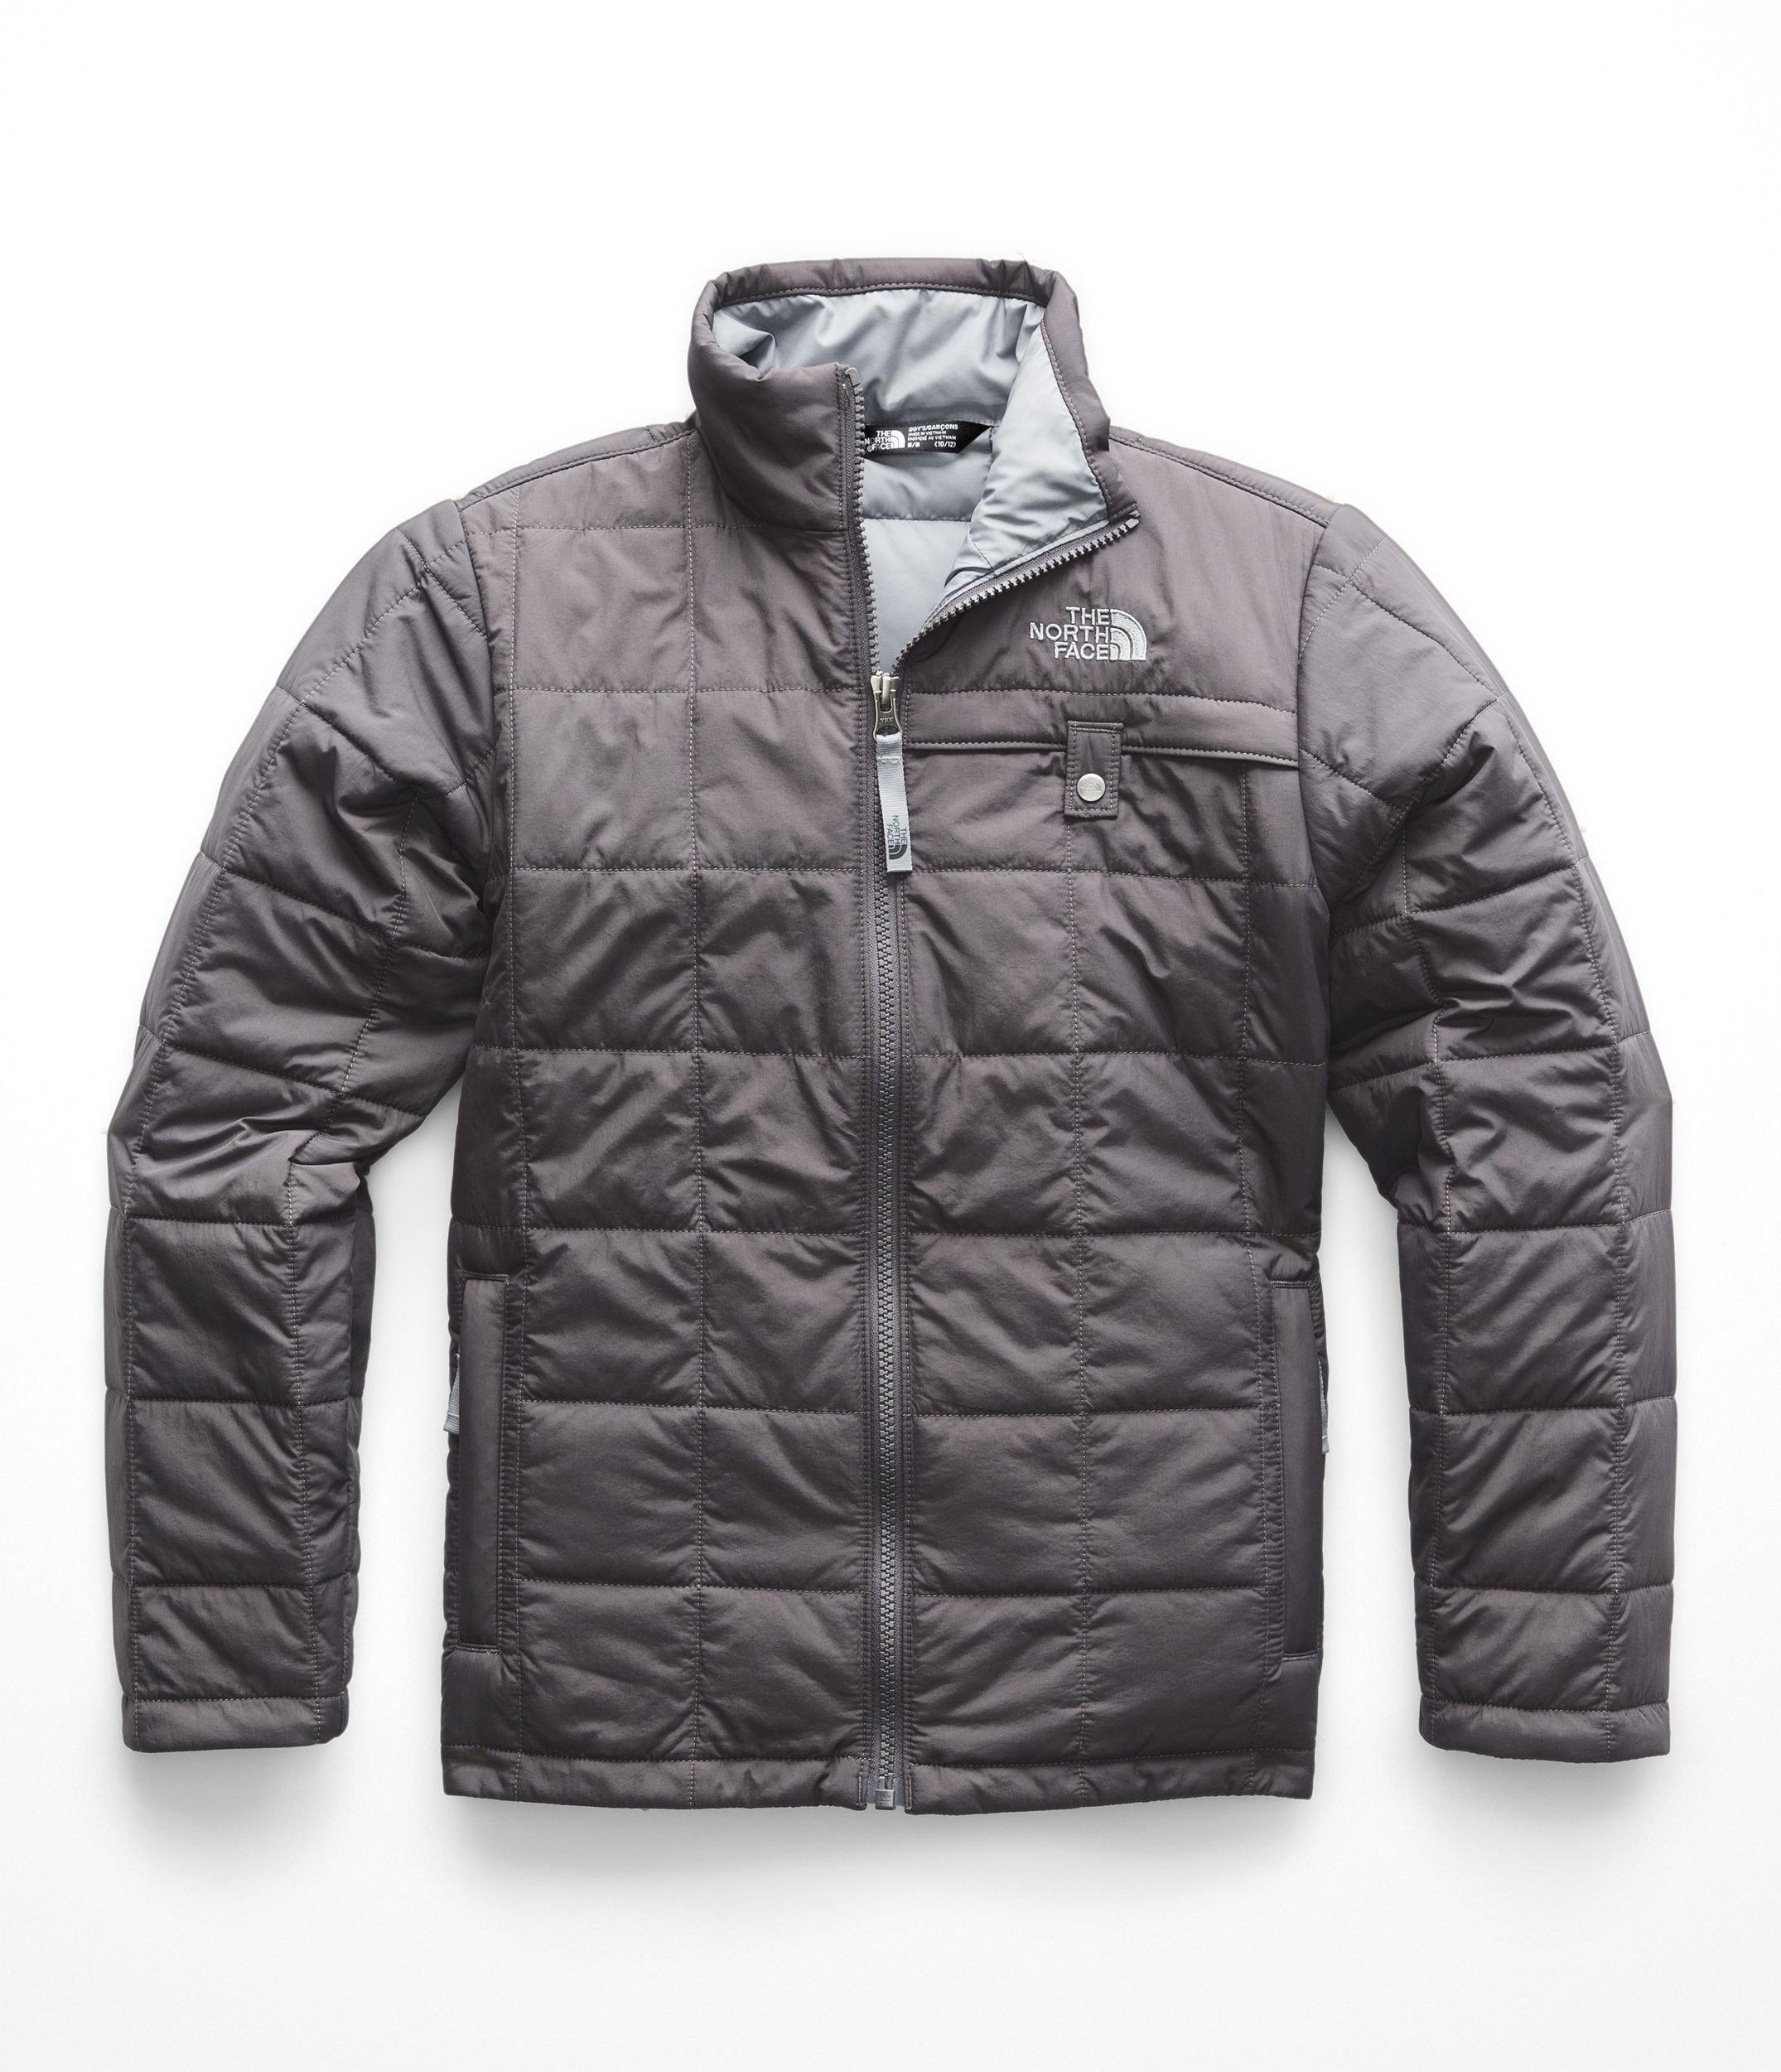 The North Face Boys Harway Jacket - Graphite Grey & Mid Grey - M